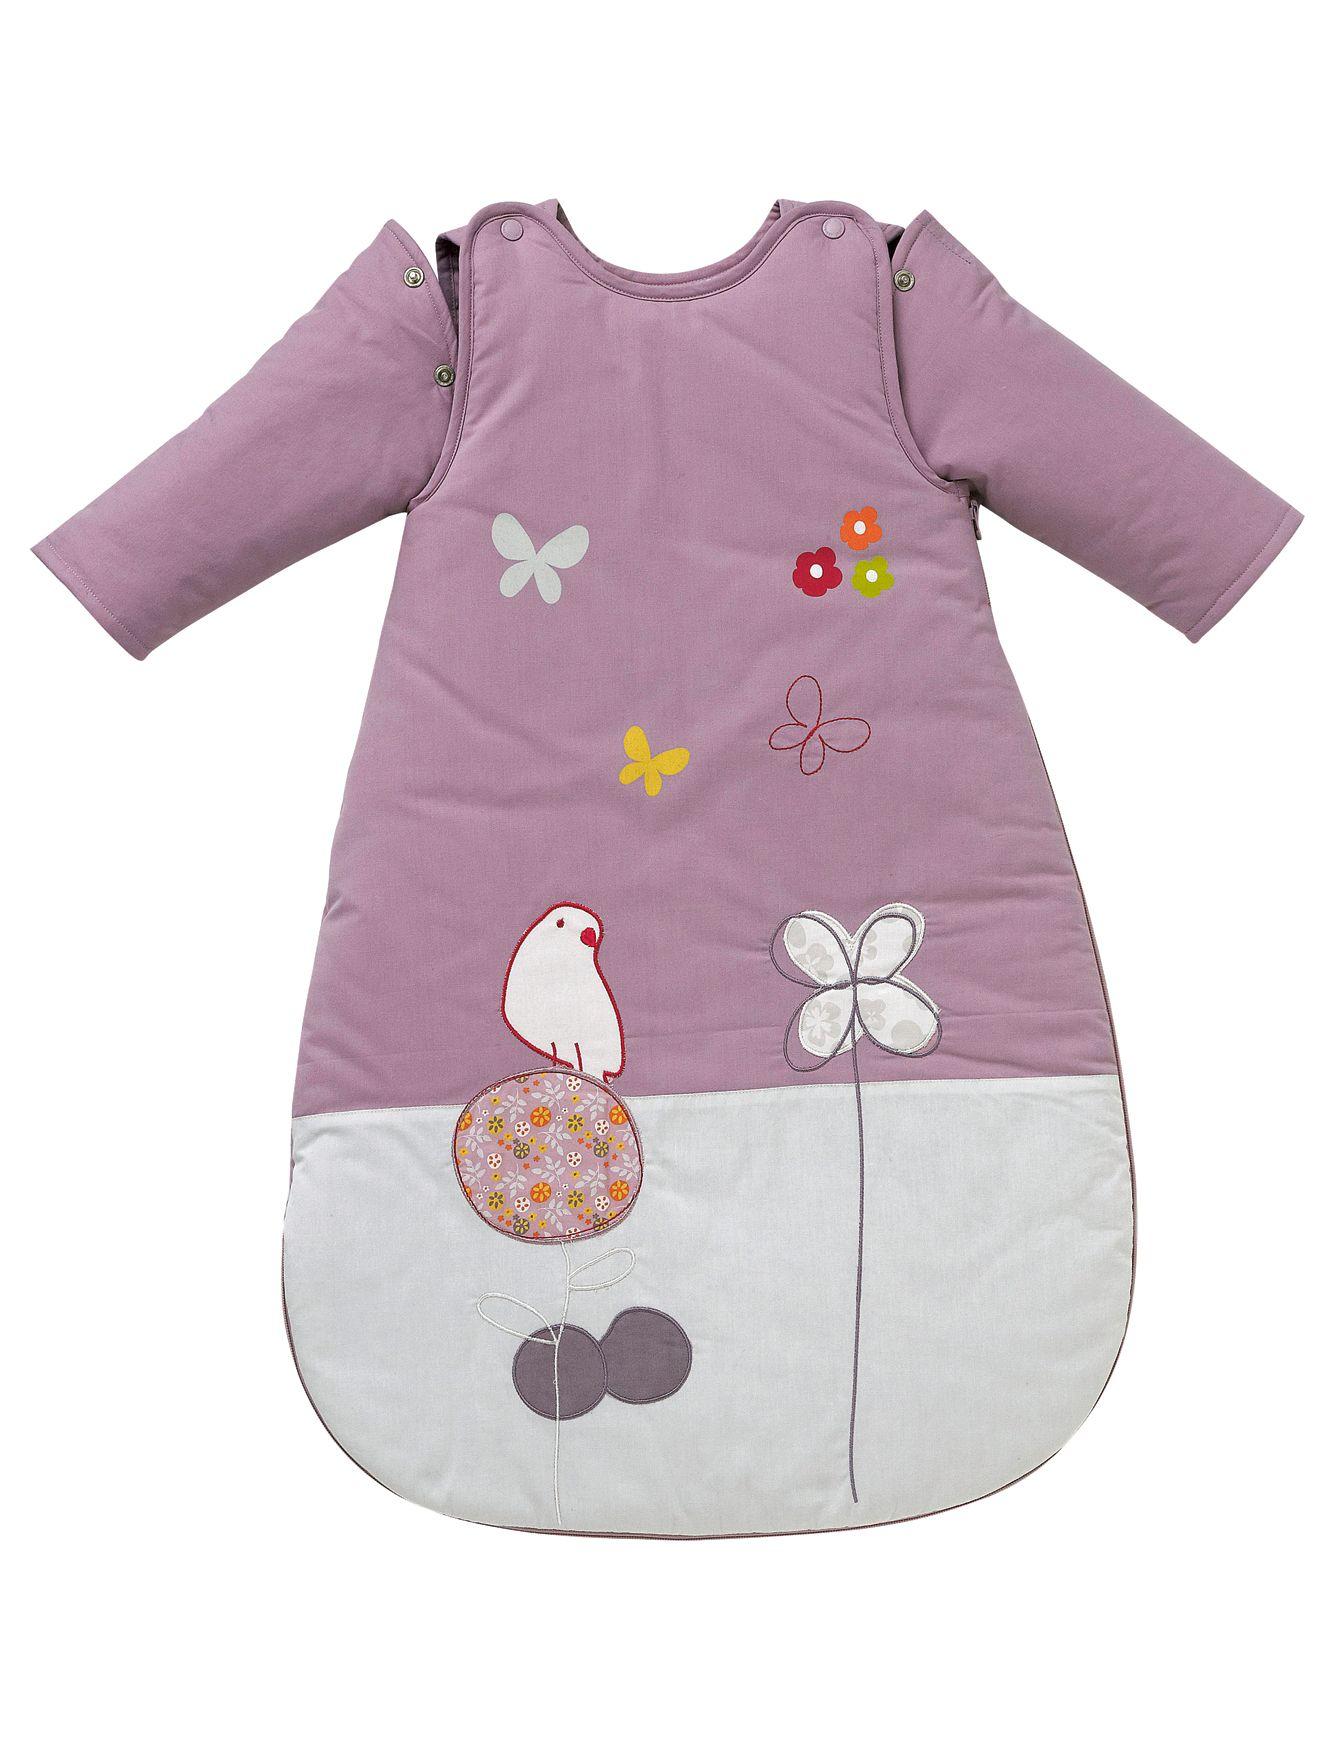 NESTING Sleep Bag With Detachable Sleeves Nursery